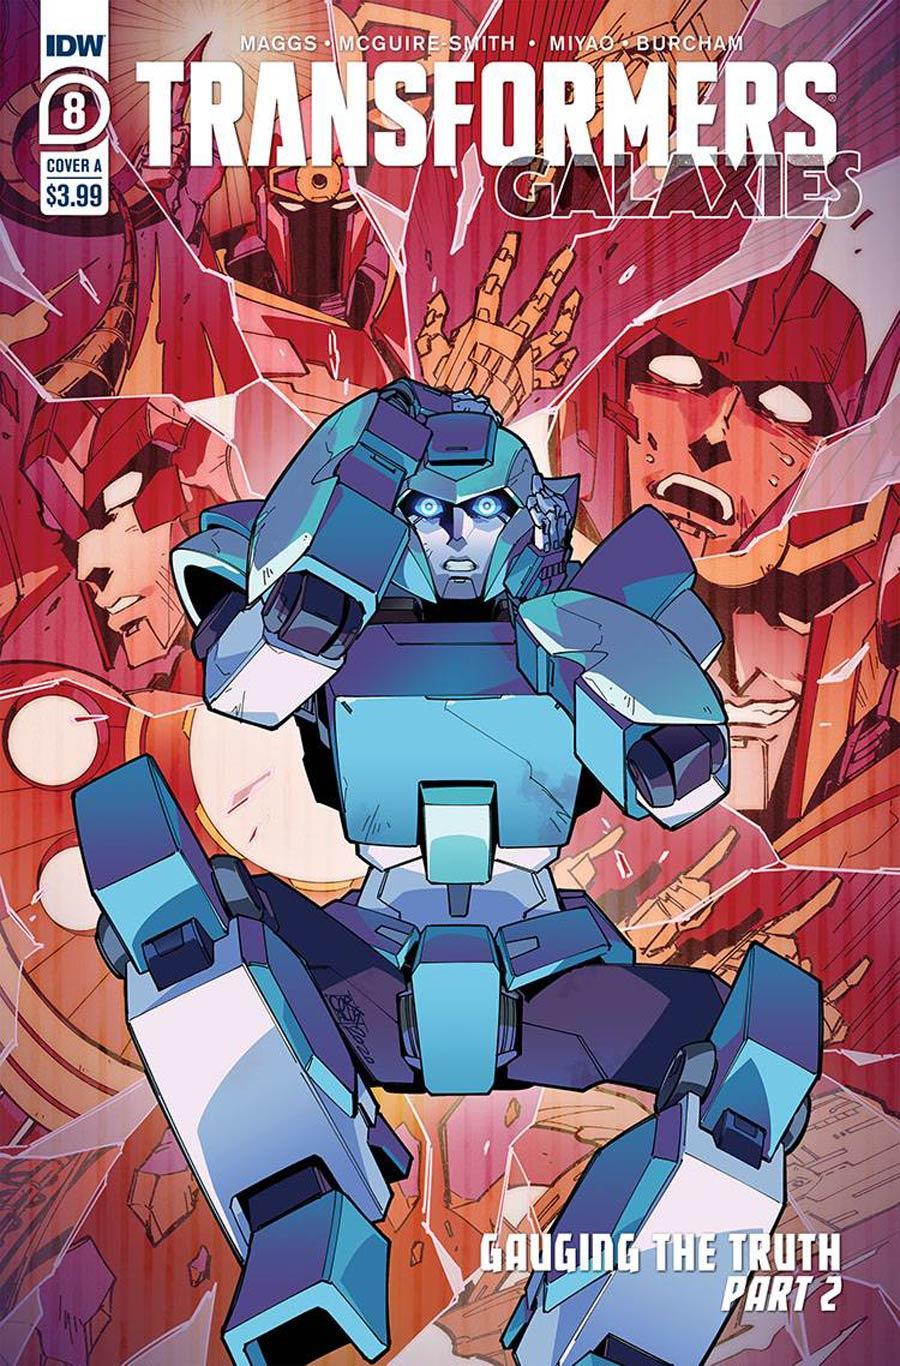 Transformers: Galaxies #8 (2020)